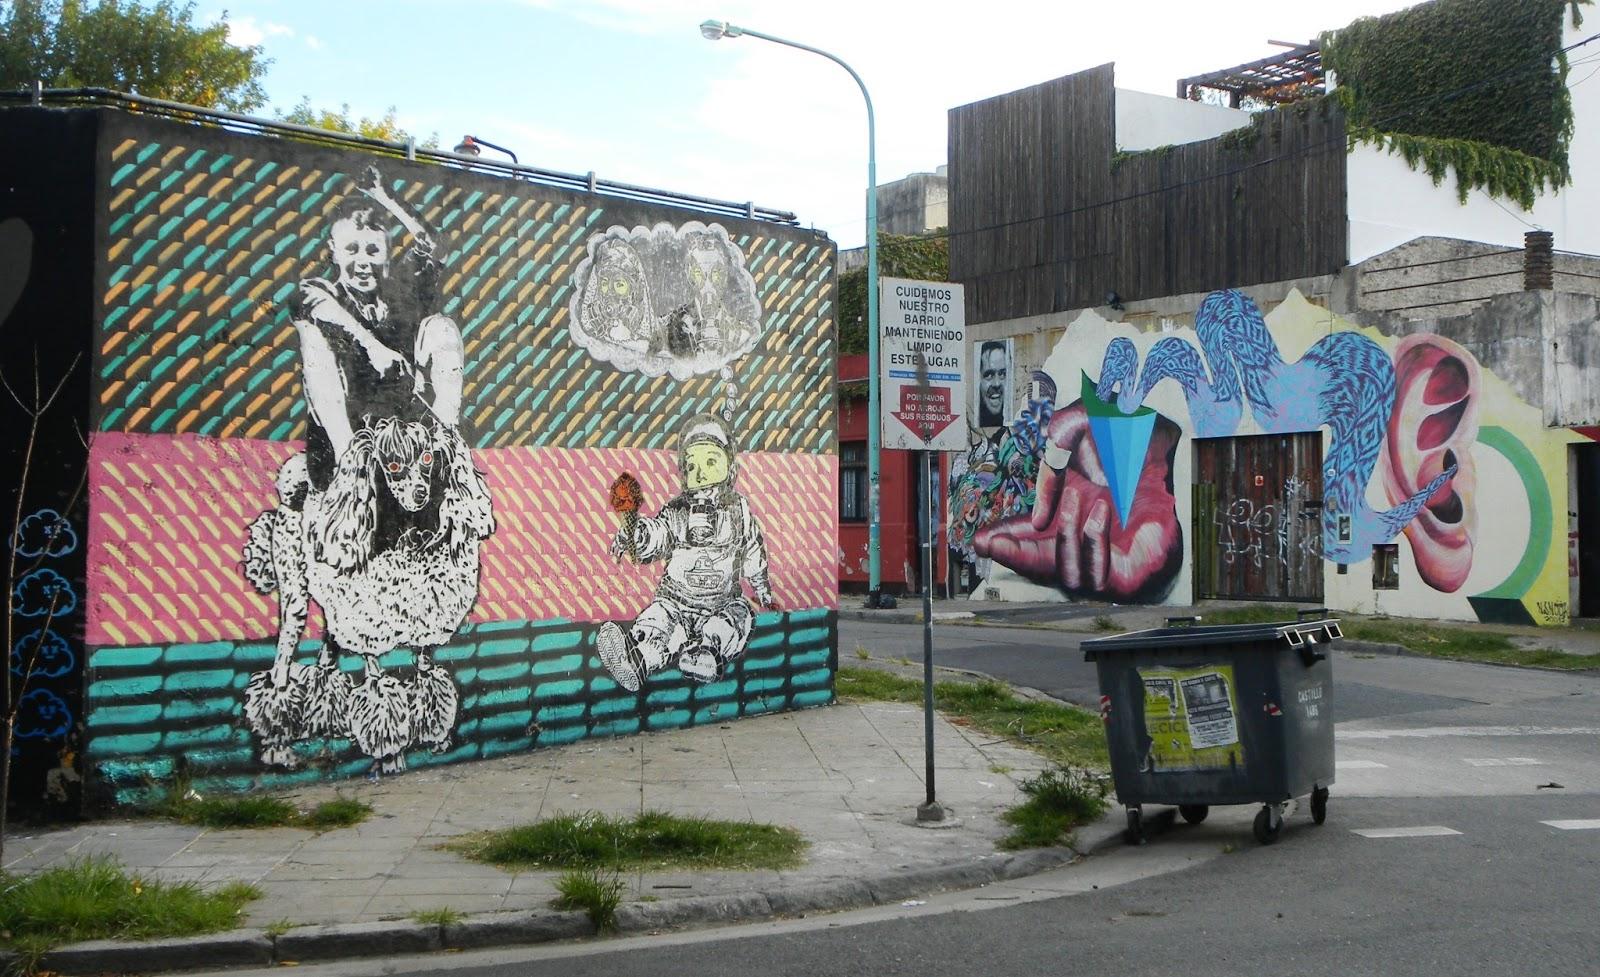 Graffiti art persuasive essay - Is Graffiti Art Or Vandalism Thesis Writinggroups Web Fc Com The Art Gallery With Several Art